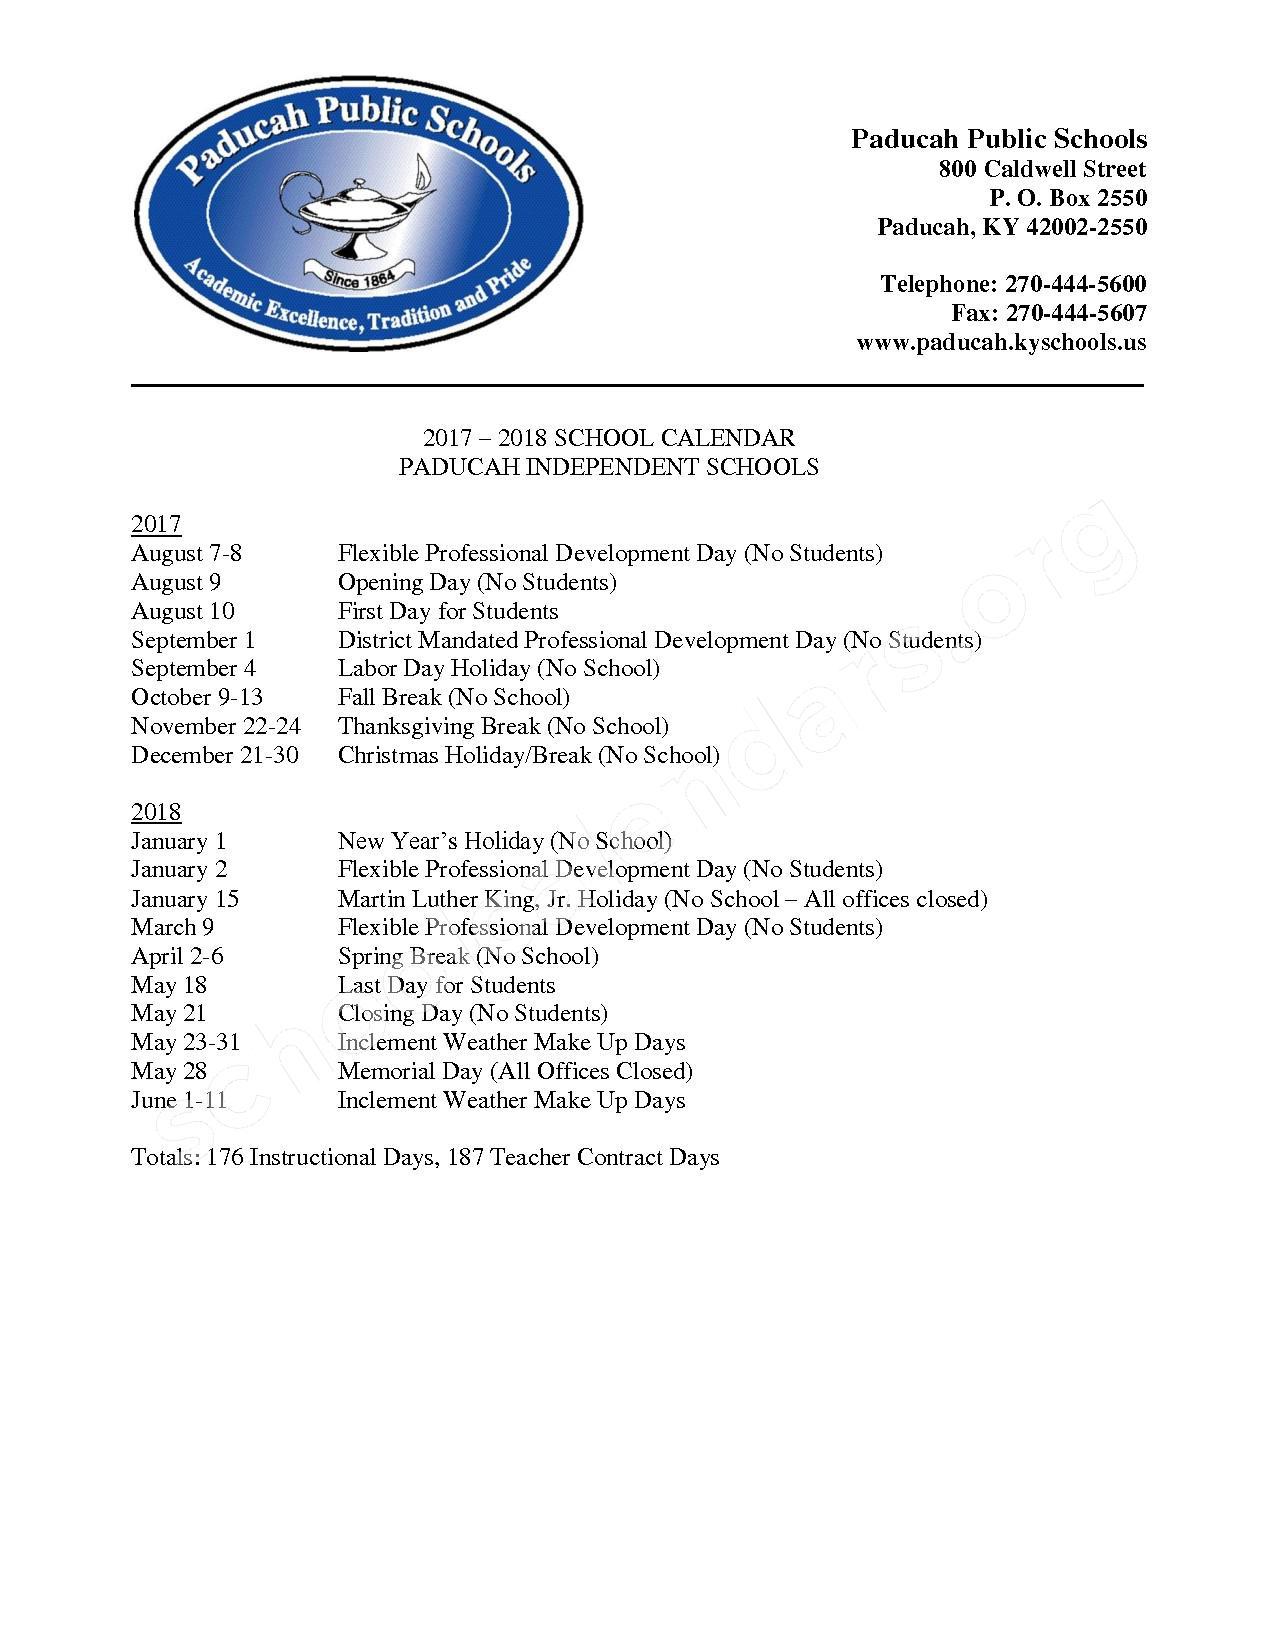 2017 - 2018 School Calendar – Paducah Independent School District – page 1